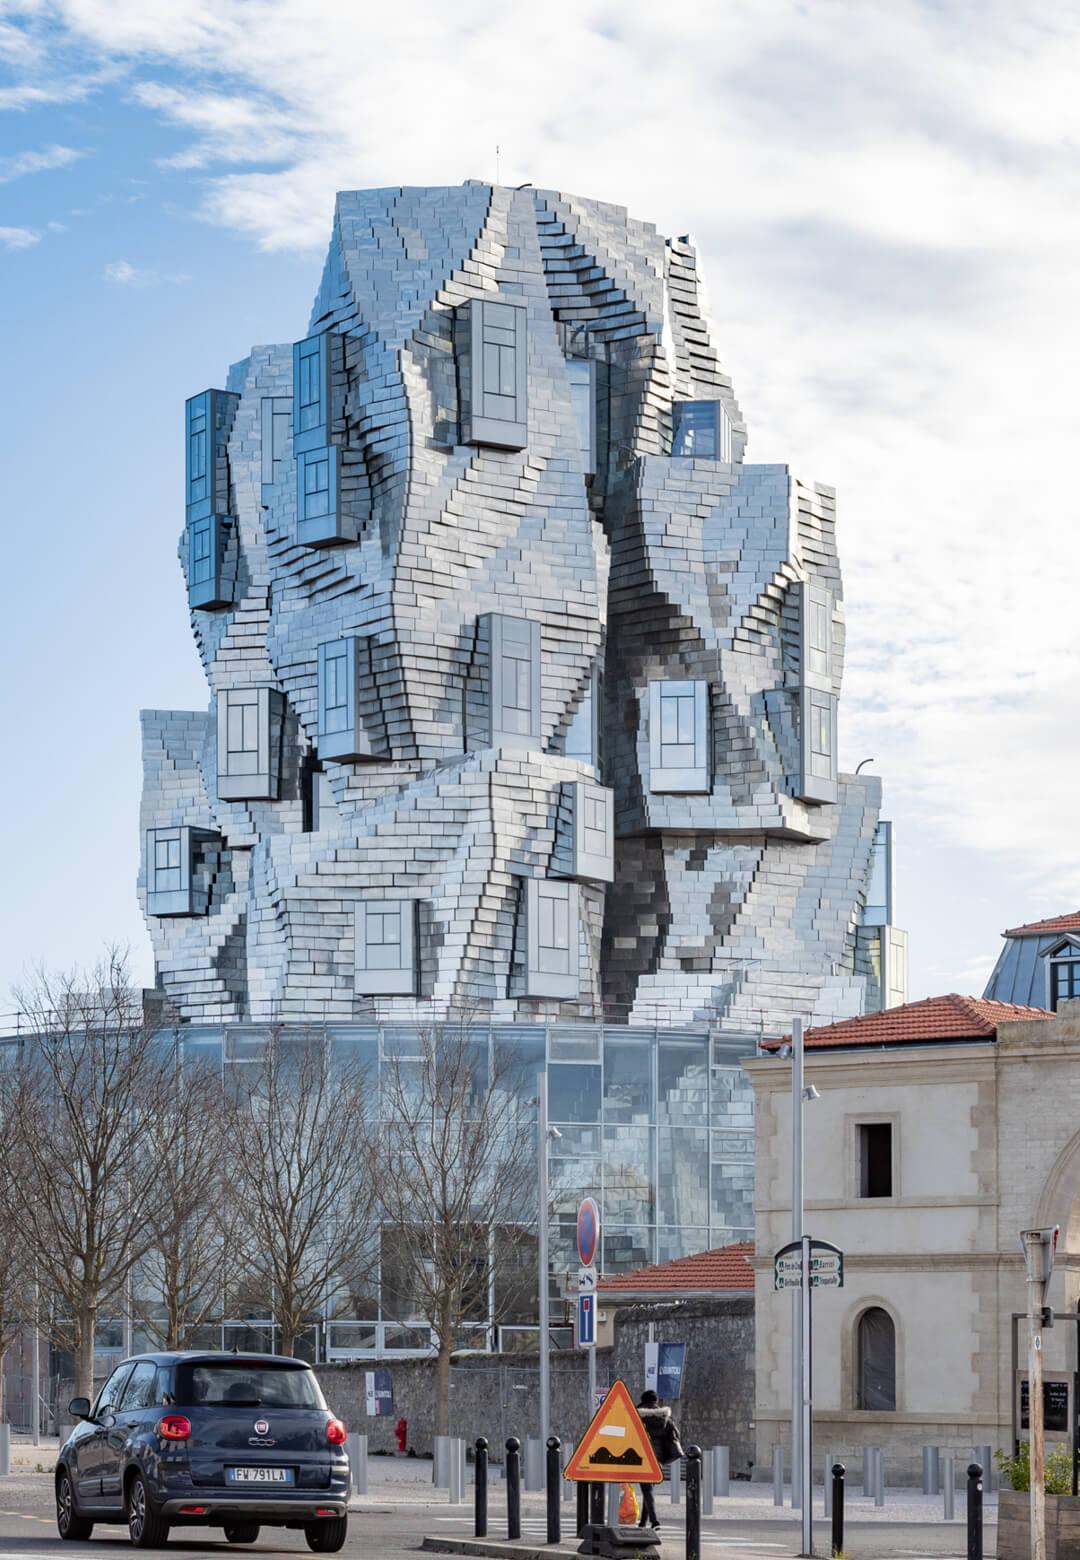 Frank Gehry's Luma tower is the centre piece of the Luma Arles development as an Arts Centre in Arles, France | Luma Towers | Frank Gehry | STIRworld